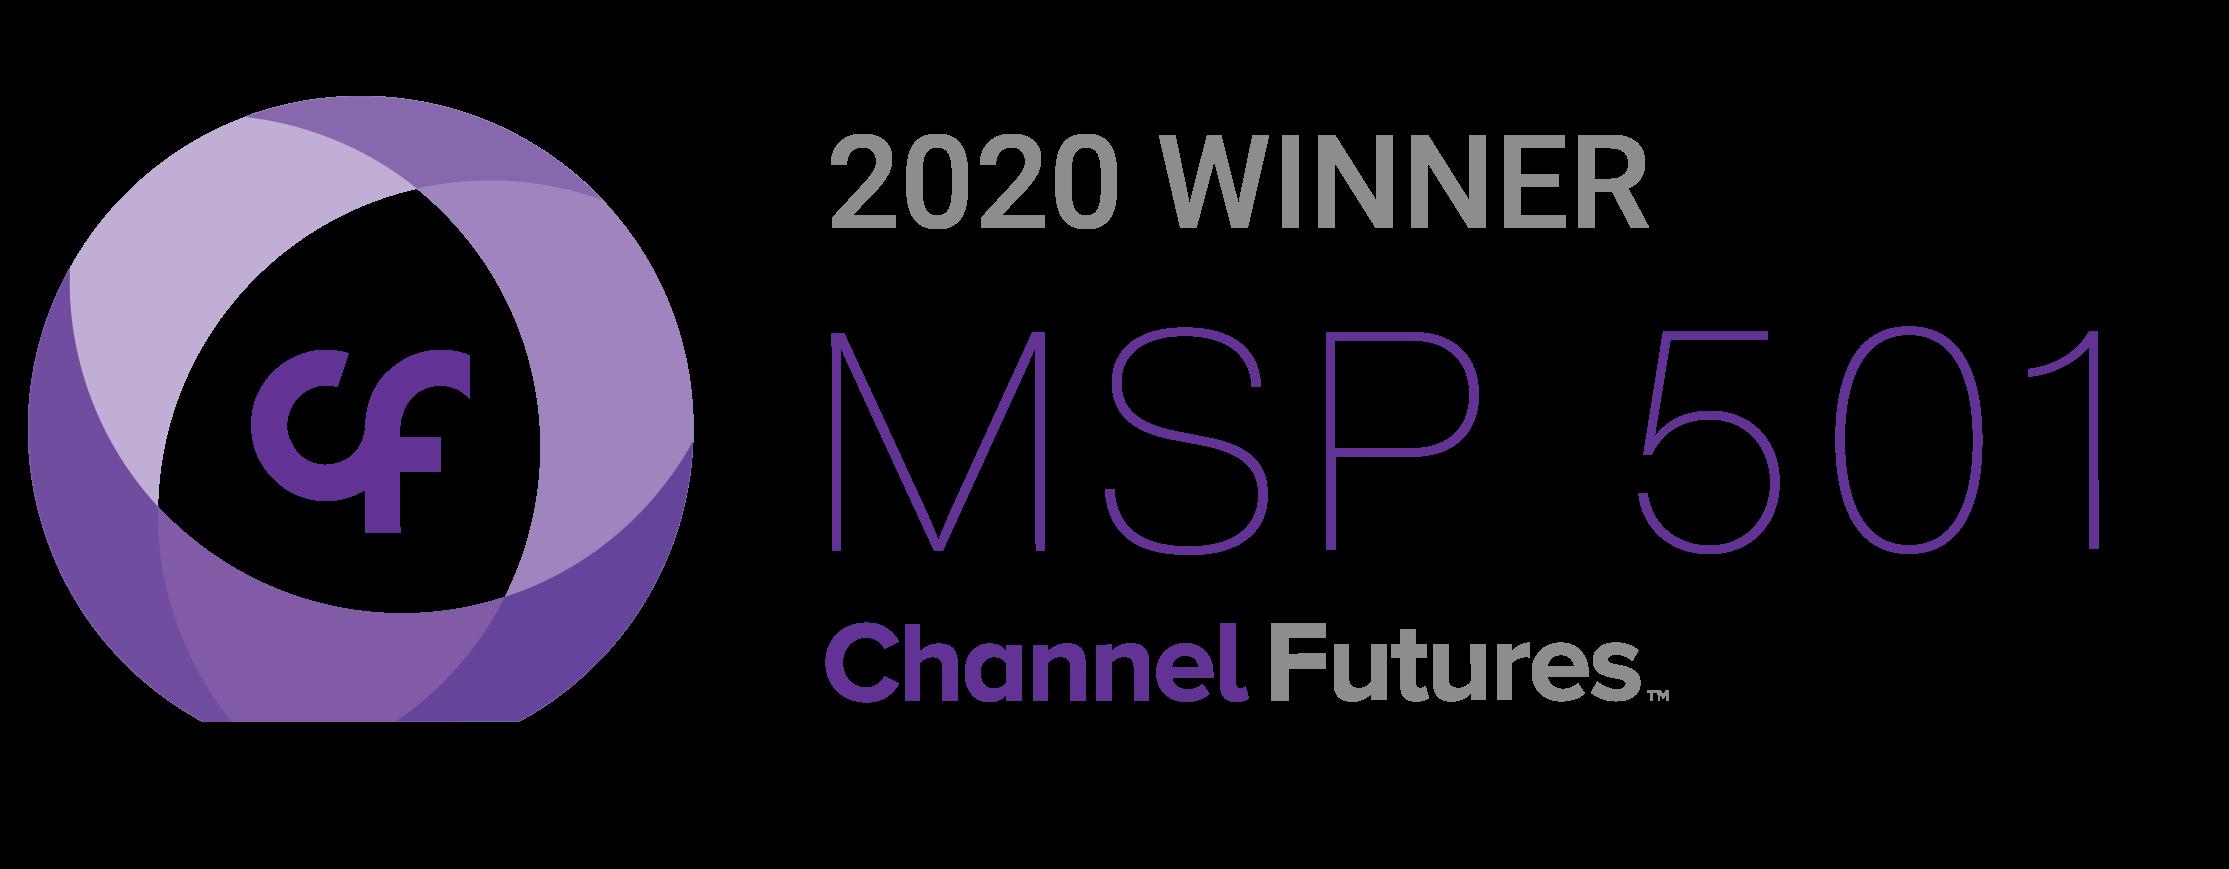 2020-MSP-501-Winner Skinny